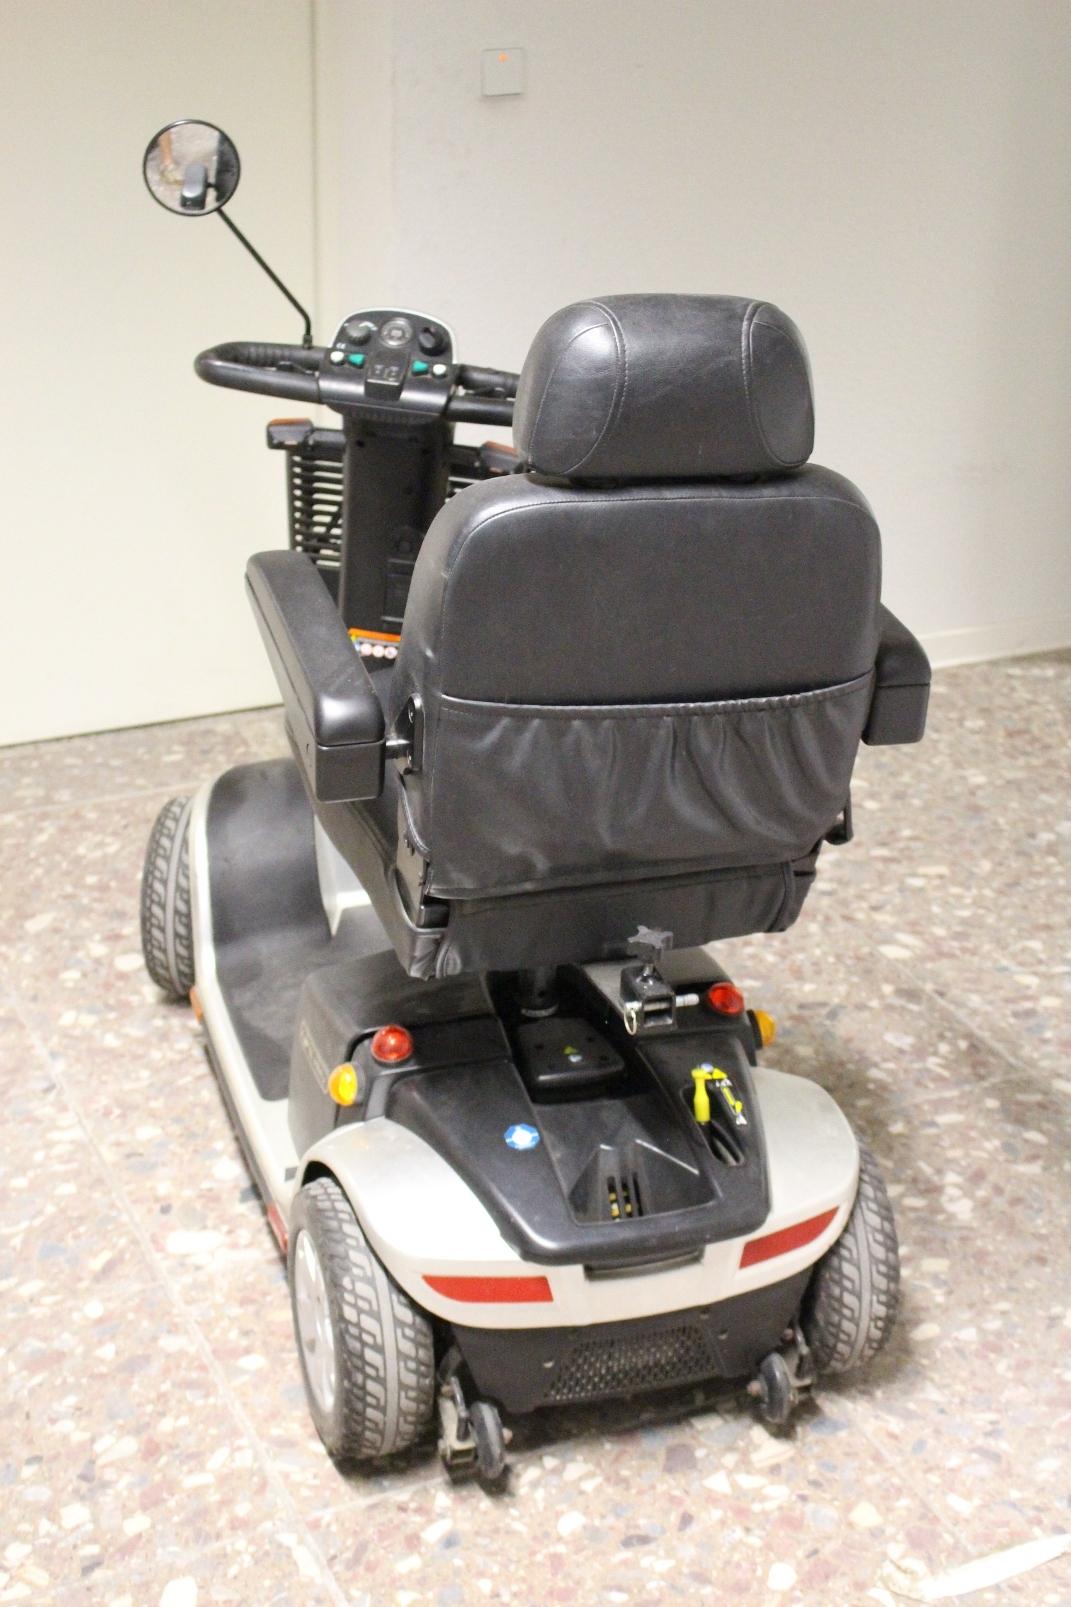 life hmv trendmobil elektromobil scooter 6 km h elektro fahrzeug senioren mobil ebay. Black Bedroom Furniture Sets. Home Design Ideas